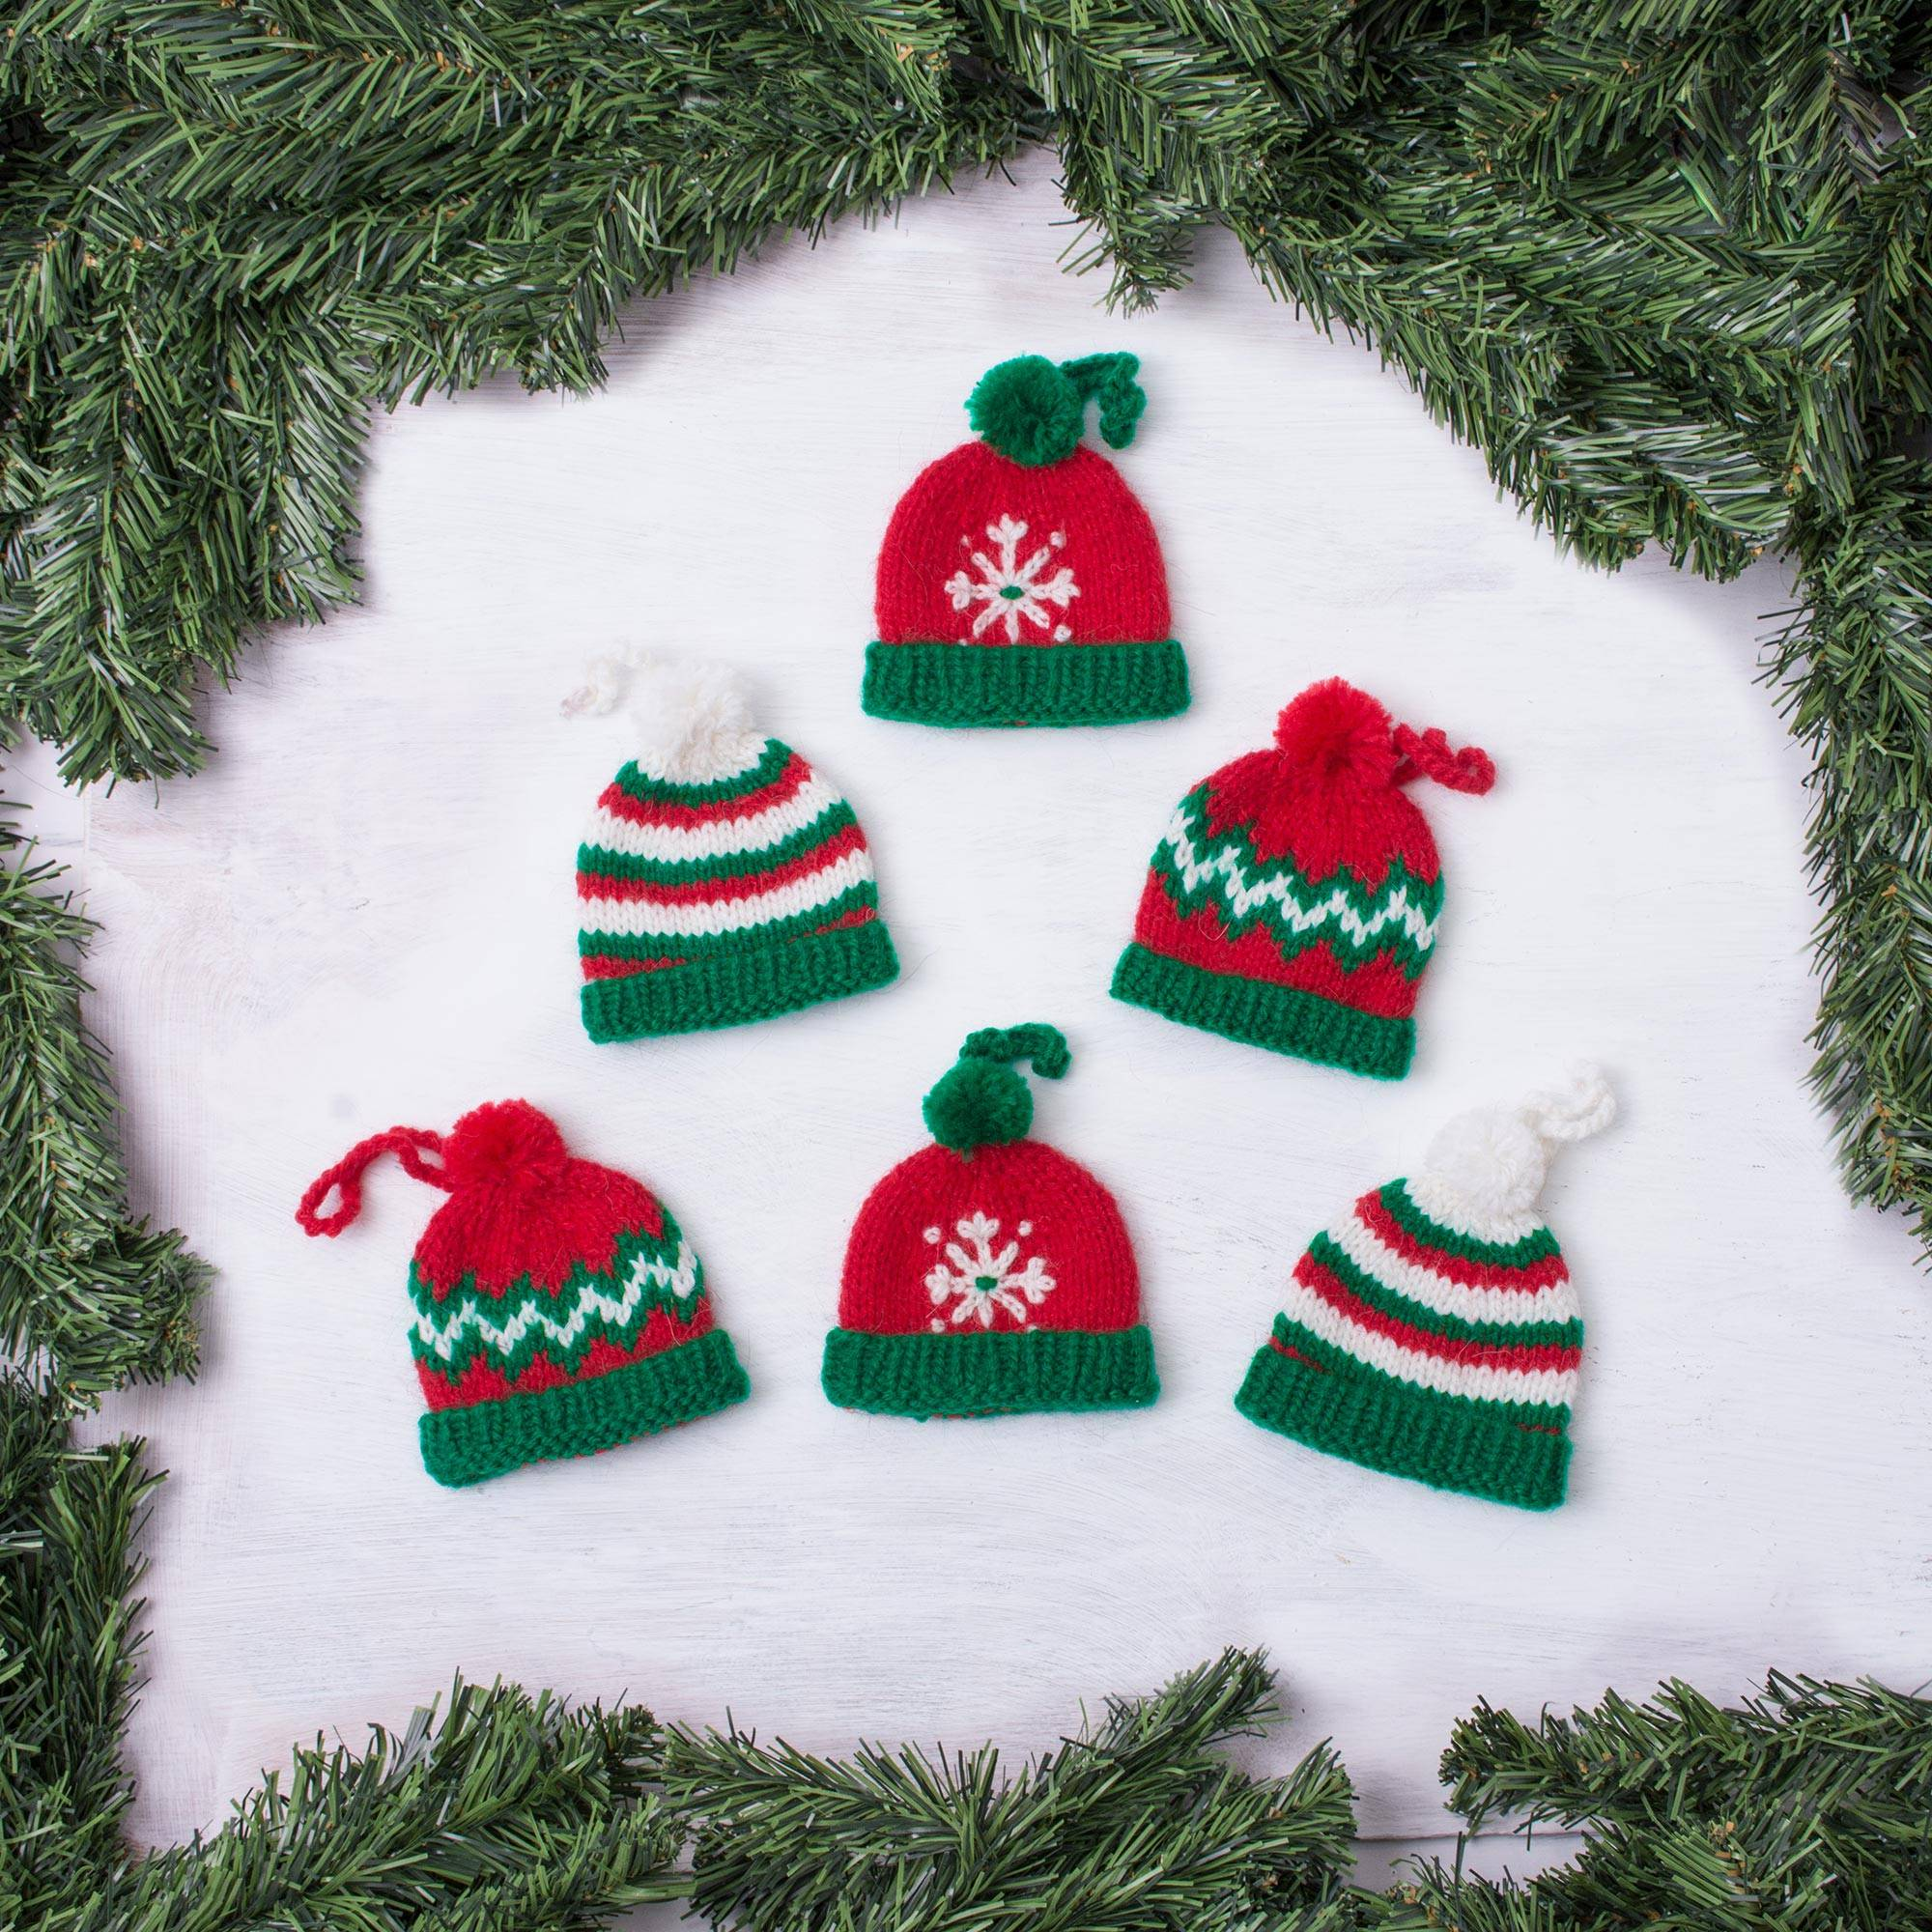 Crochet Christmas Ornaments.Hand Crocheted Christmas Themed Ornaments Set Of 6 Sweet Christmas Hats